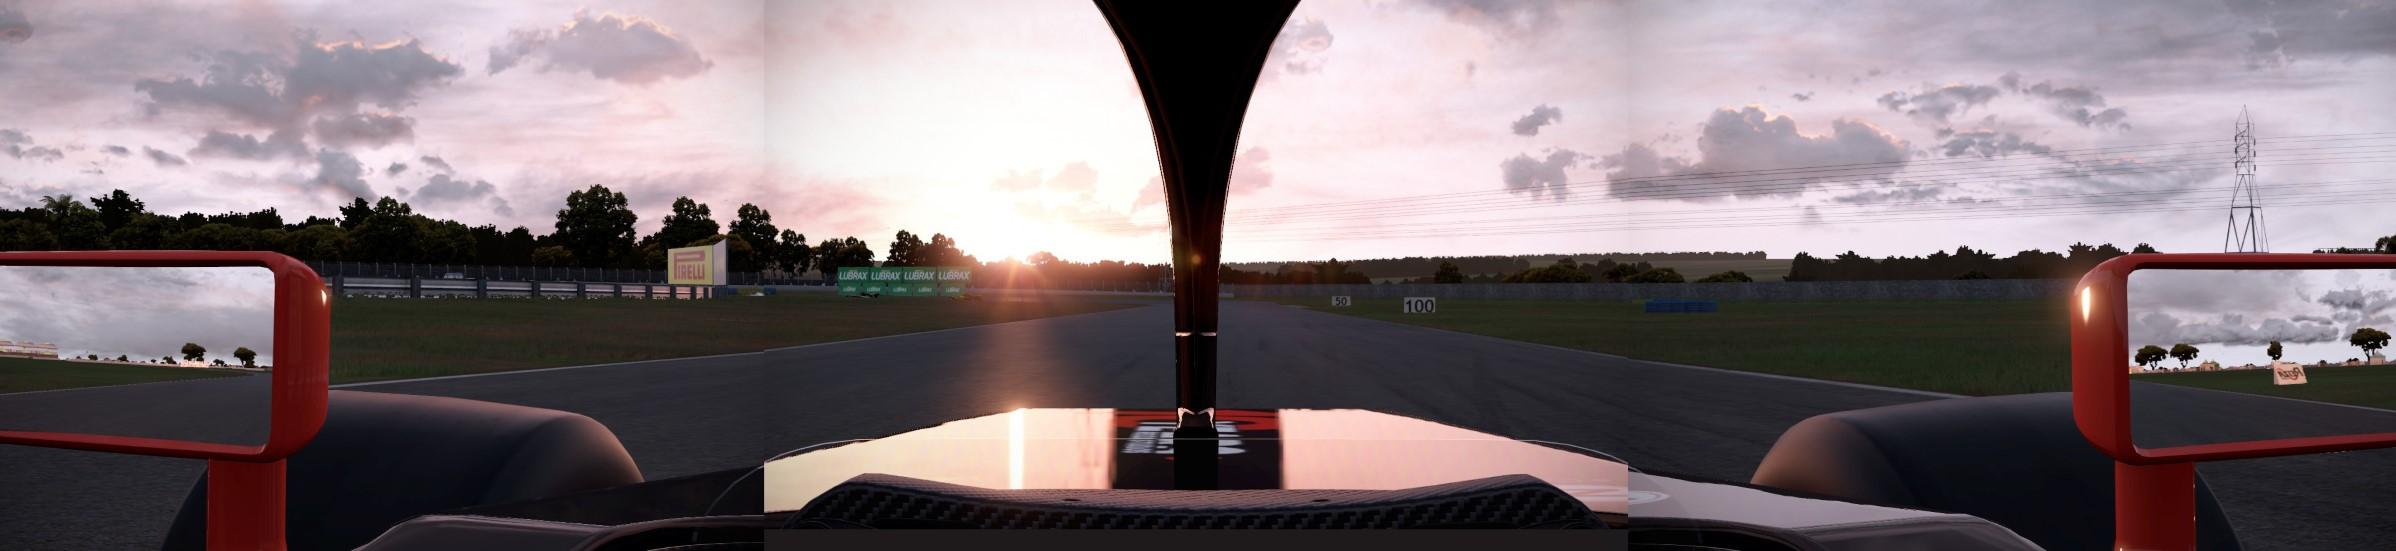 20200620144140_1-custom-jpg Automobilista 2   Share Your Screenshots